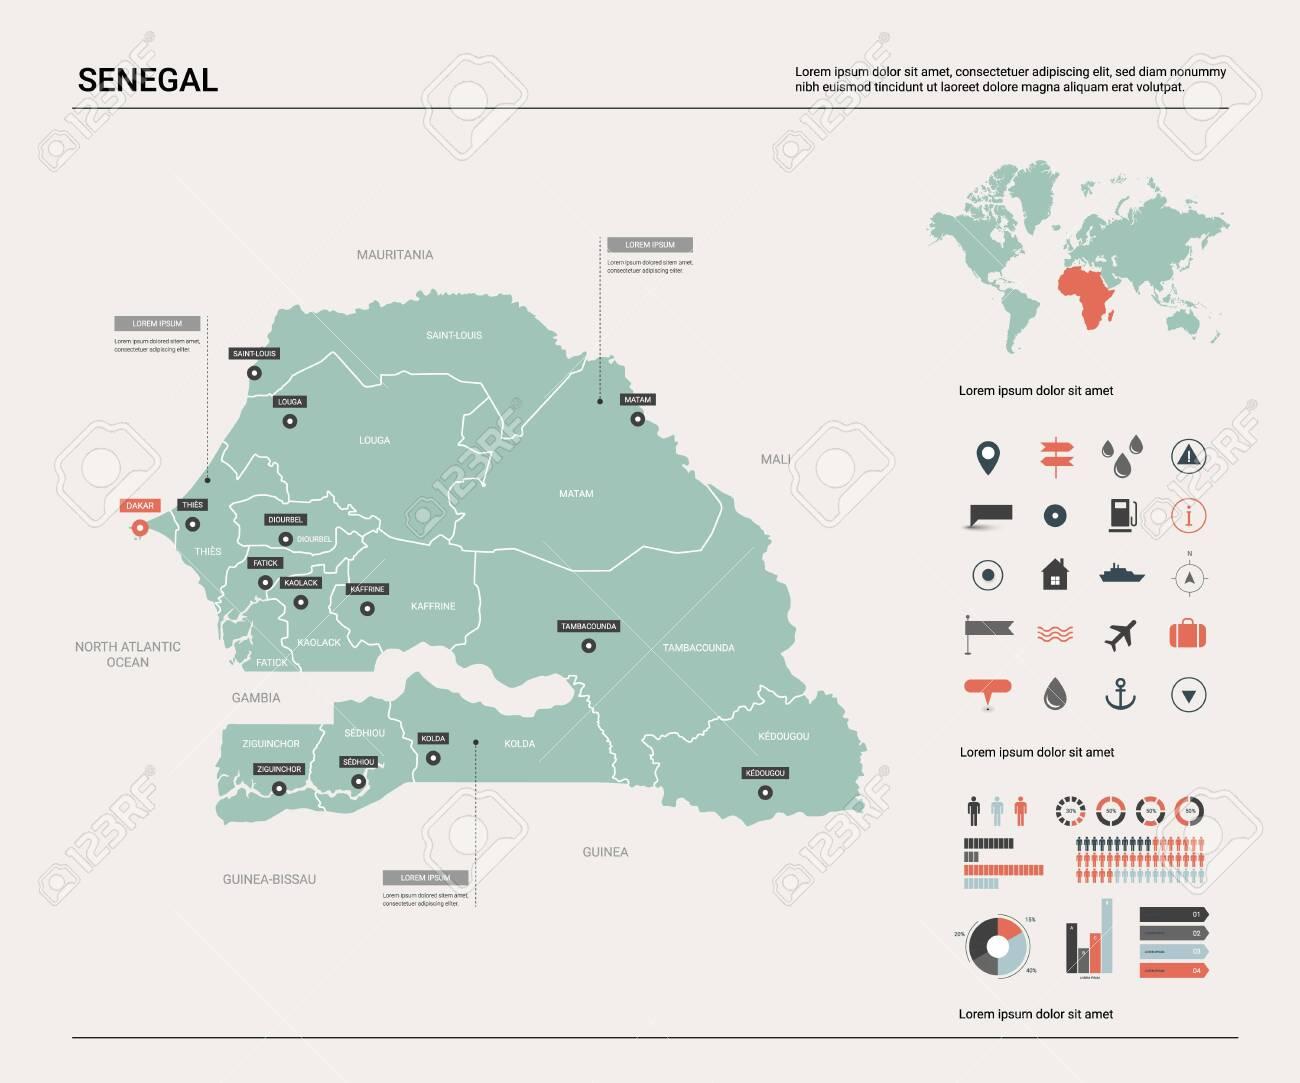 on dakar city map